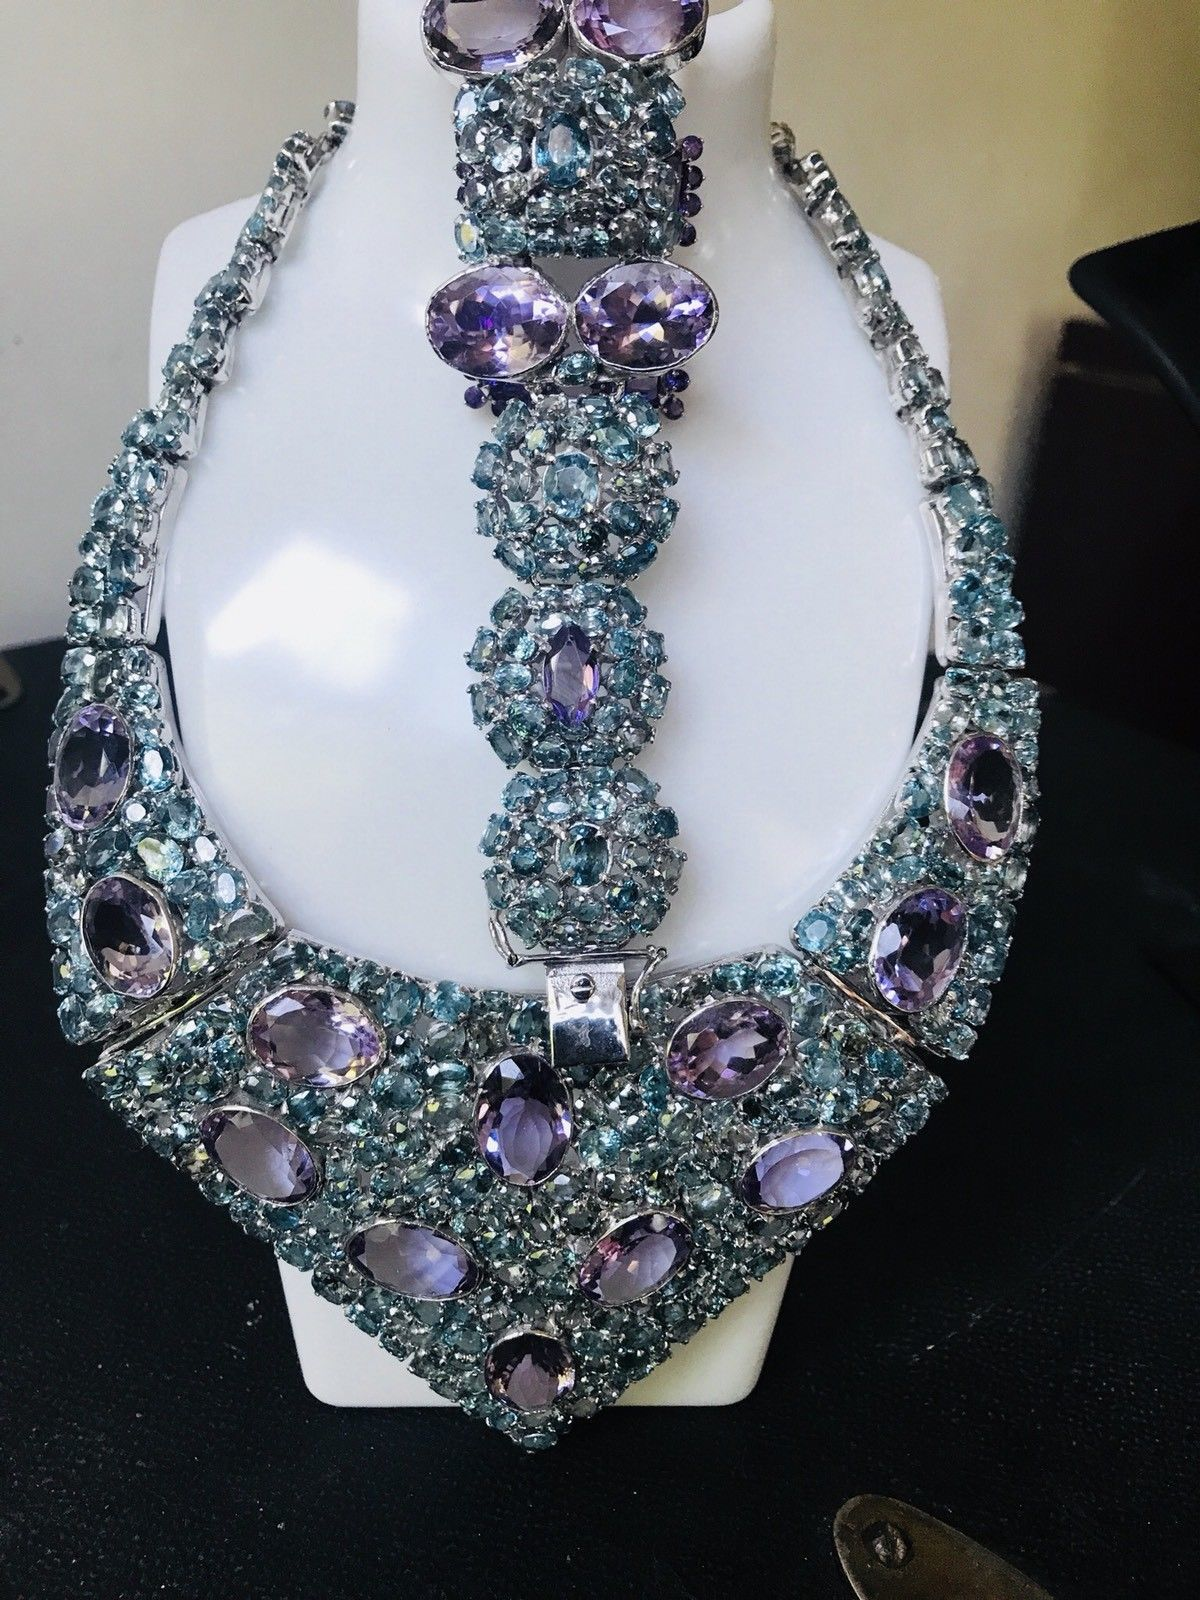 New Huge1000+ct Natural Amethyst Zircon SS necklace, bracelet,  earrings16.5 in